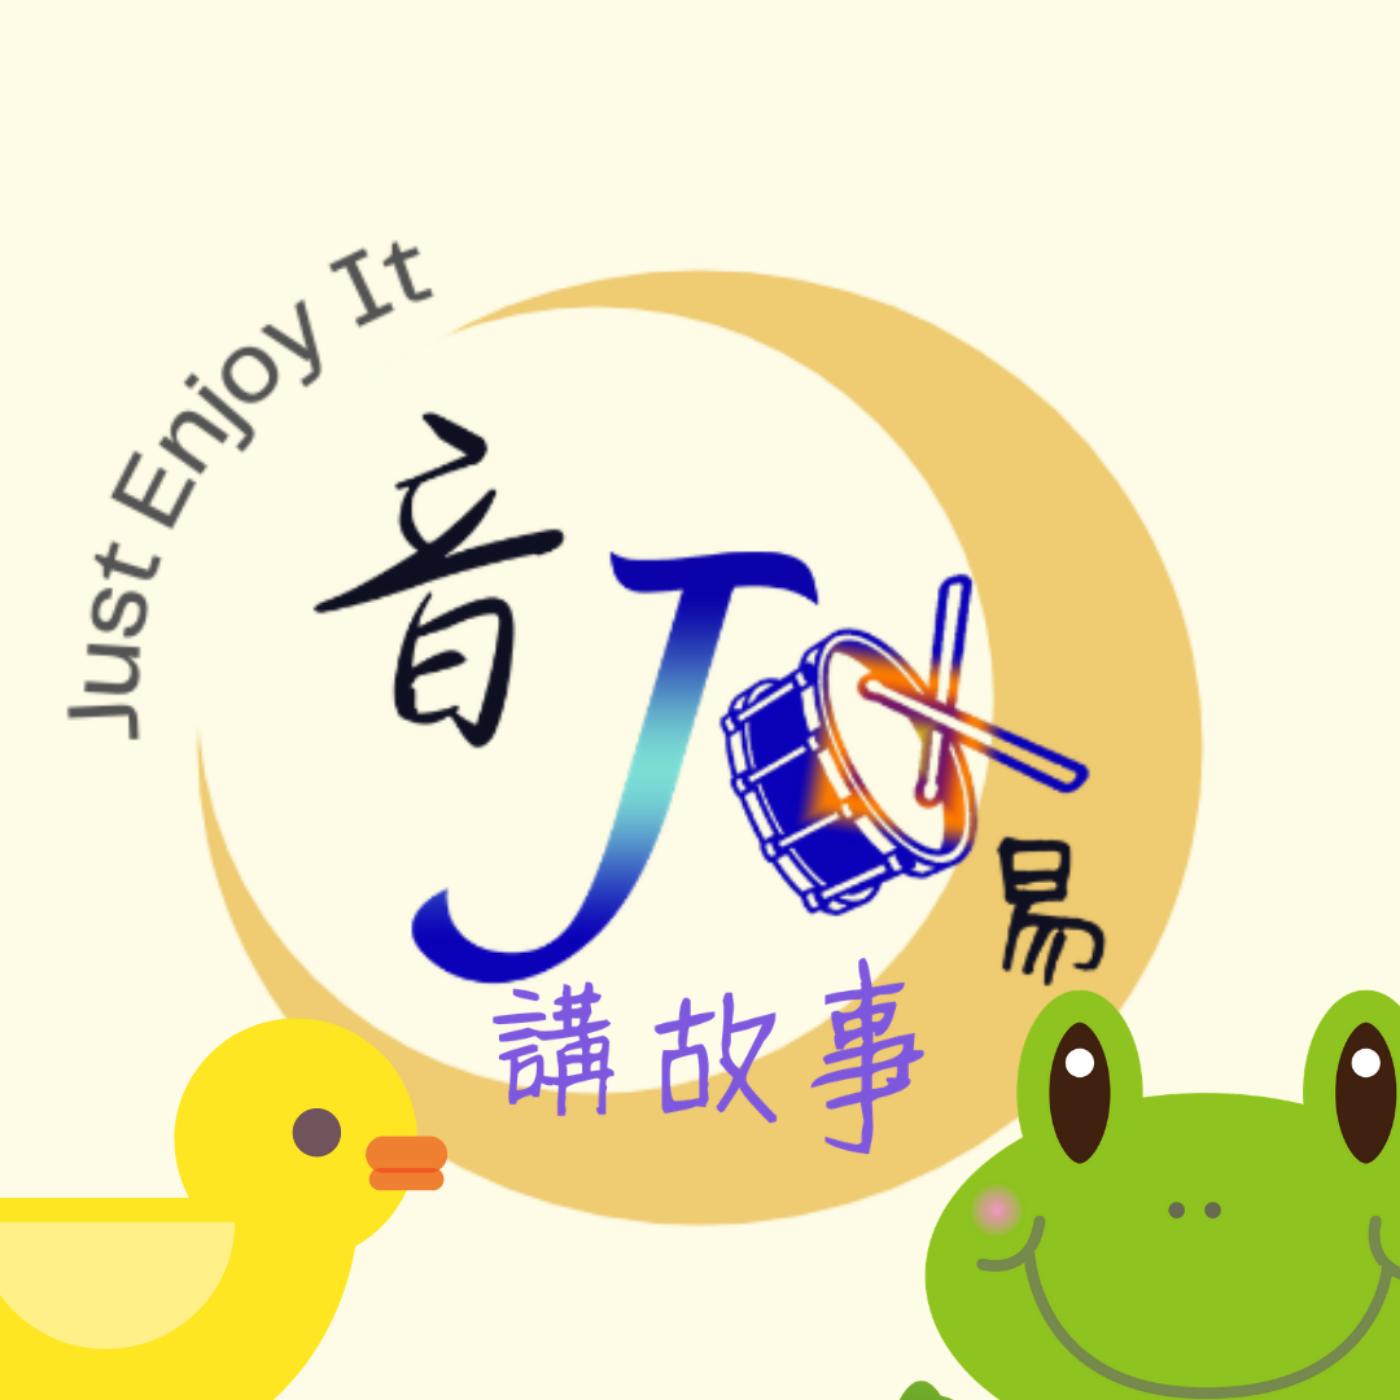 Ep.05 阿妞阿米聽故事  -  一鳴驚人 feat. JO